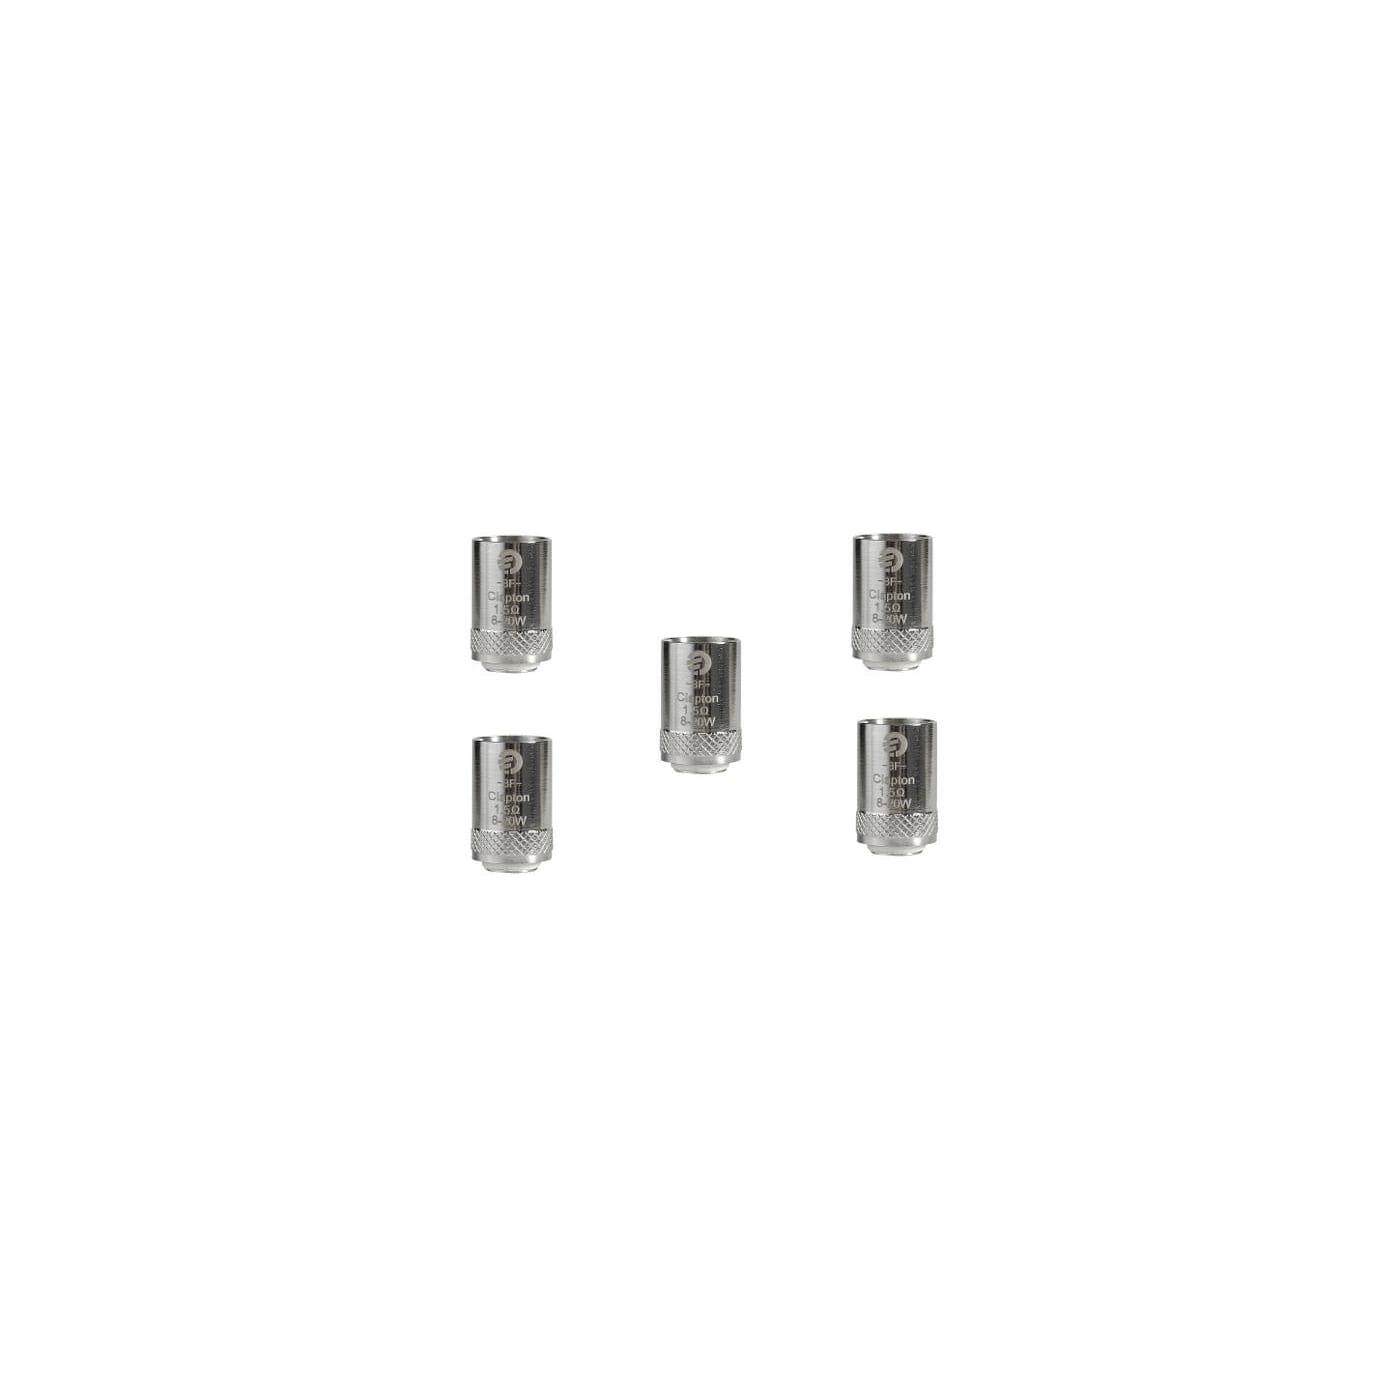 Joyetech BF Clapton Replacement Coils - 5 pack